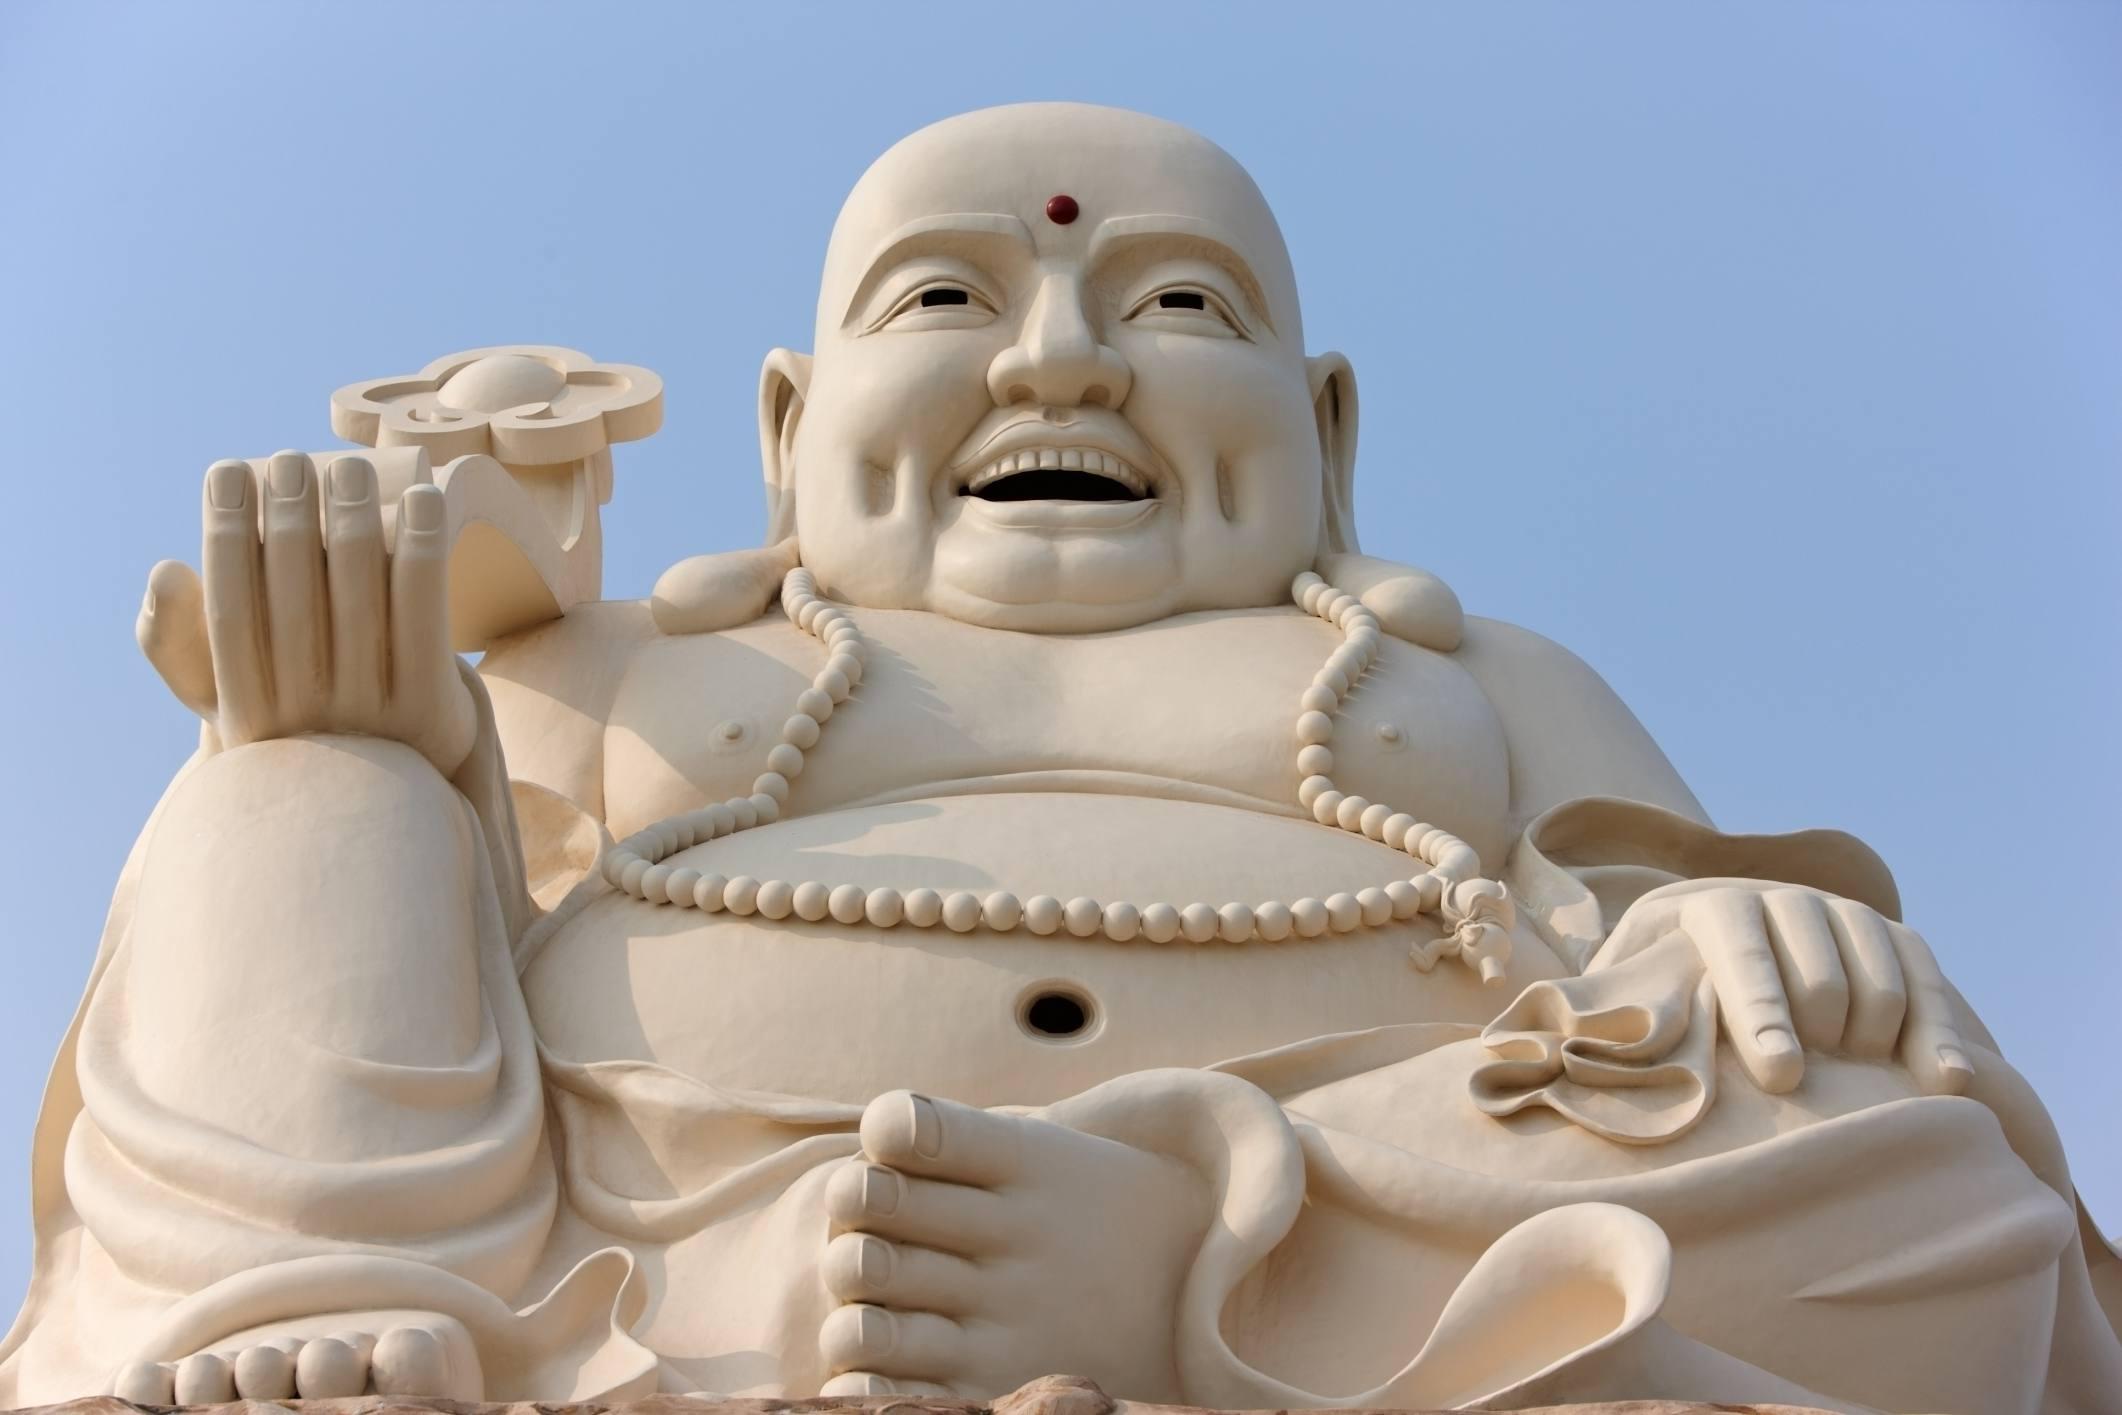 White Ceramic Budai